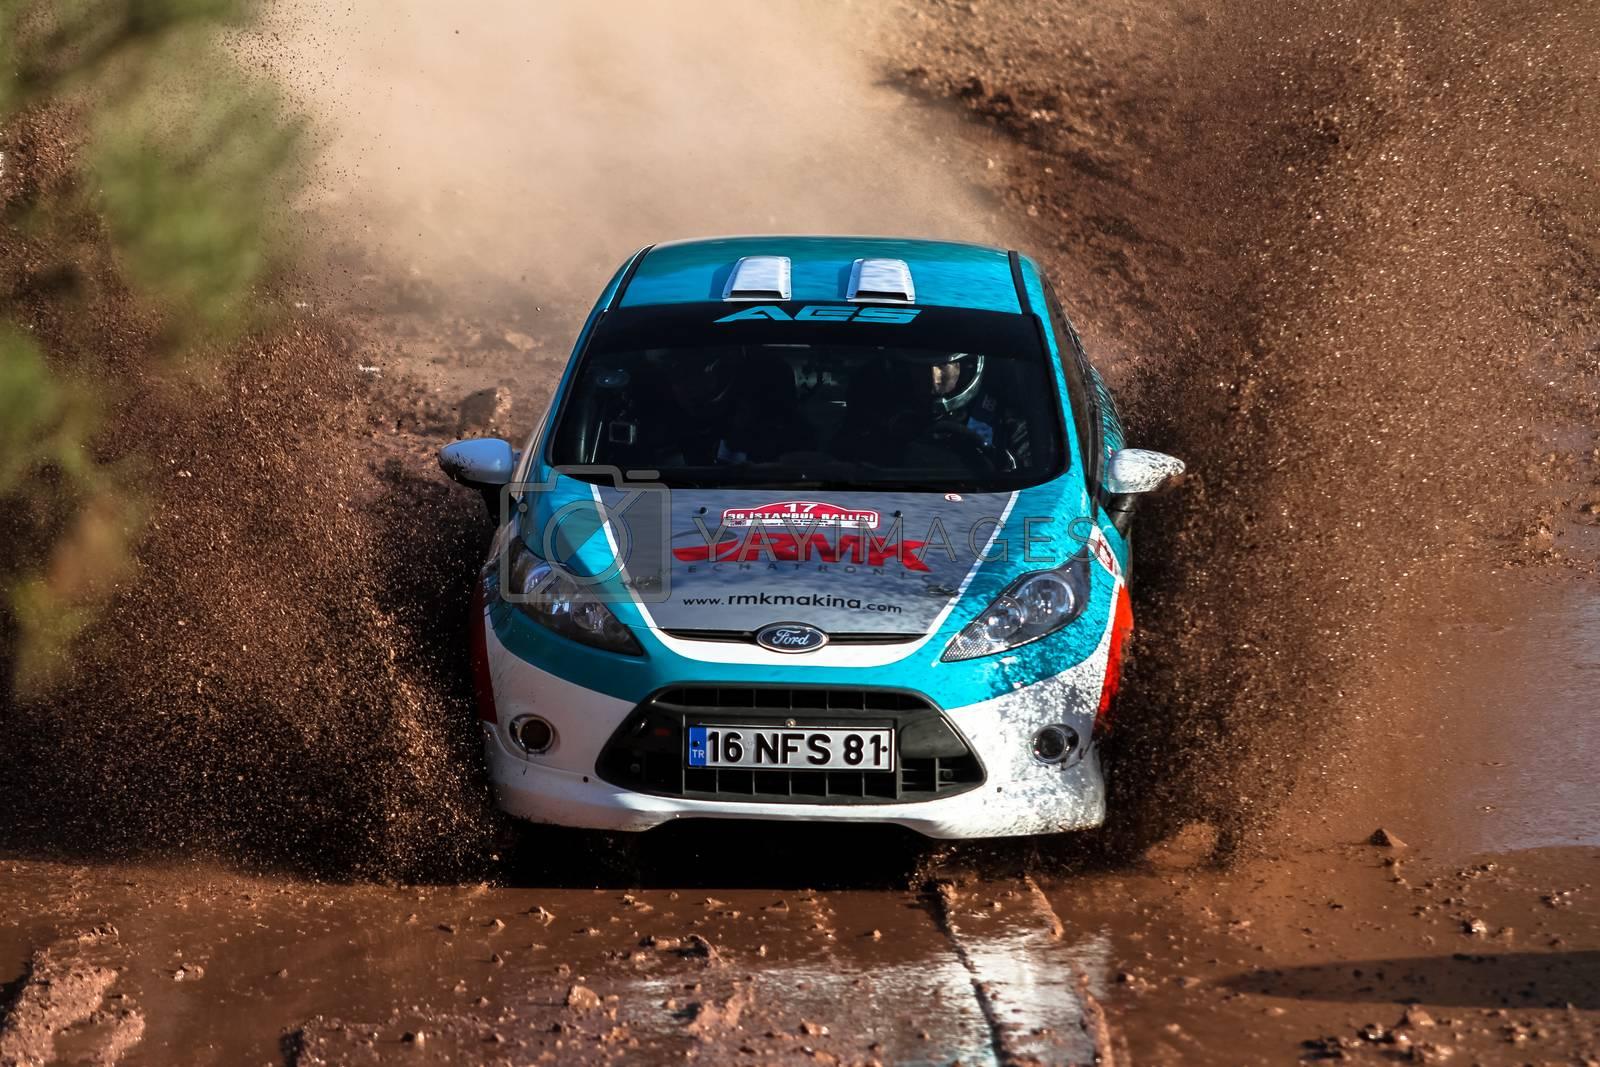 ISTANBUL, TURKEY - NOVEMBER 14, 2015: Ismet Toktas drives Ford Fiesta R2 in Isok Istanbul Rally 2015, Gocbeyli stage